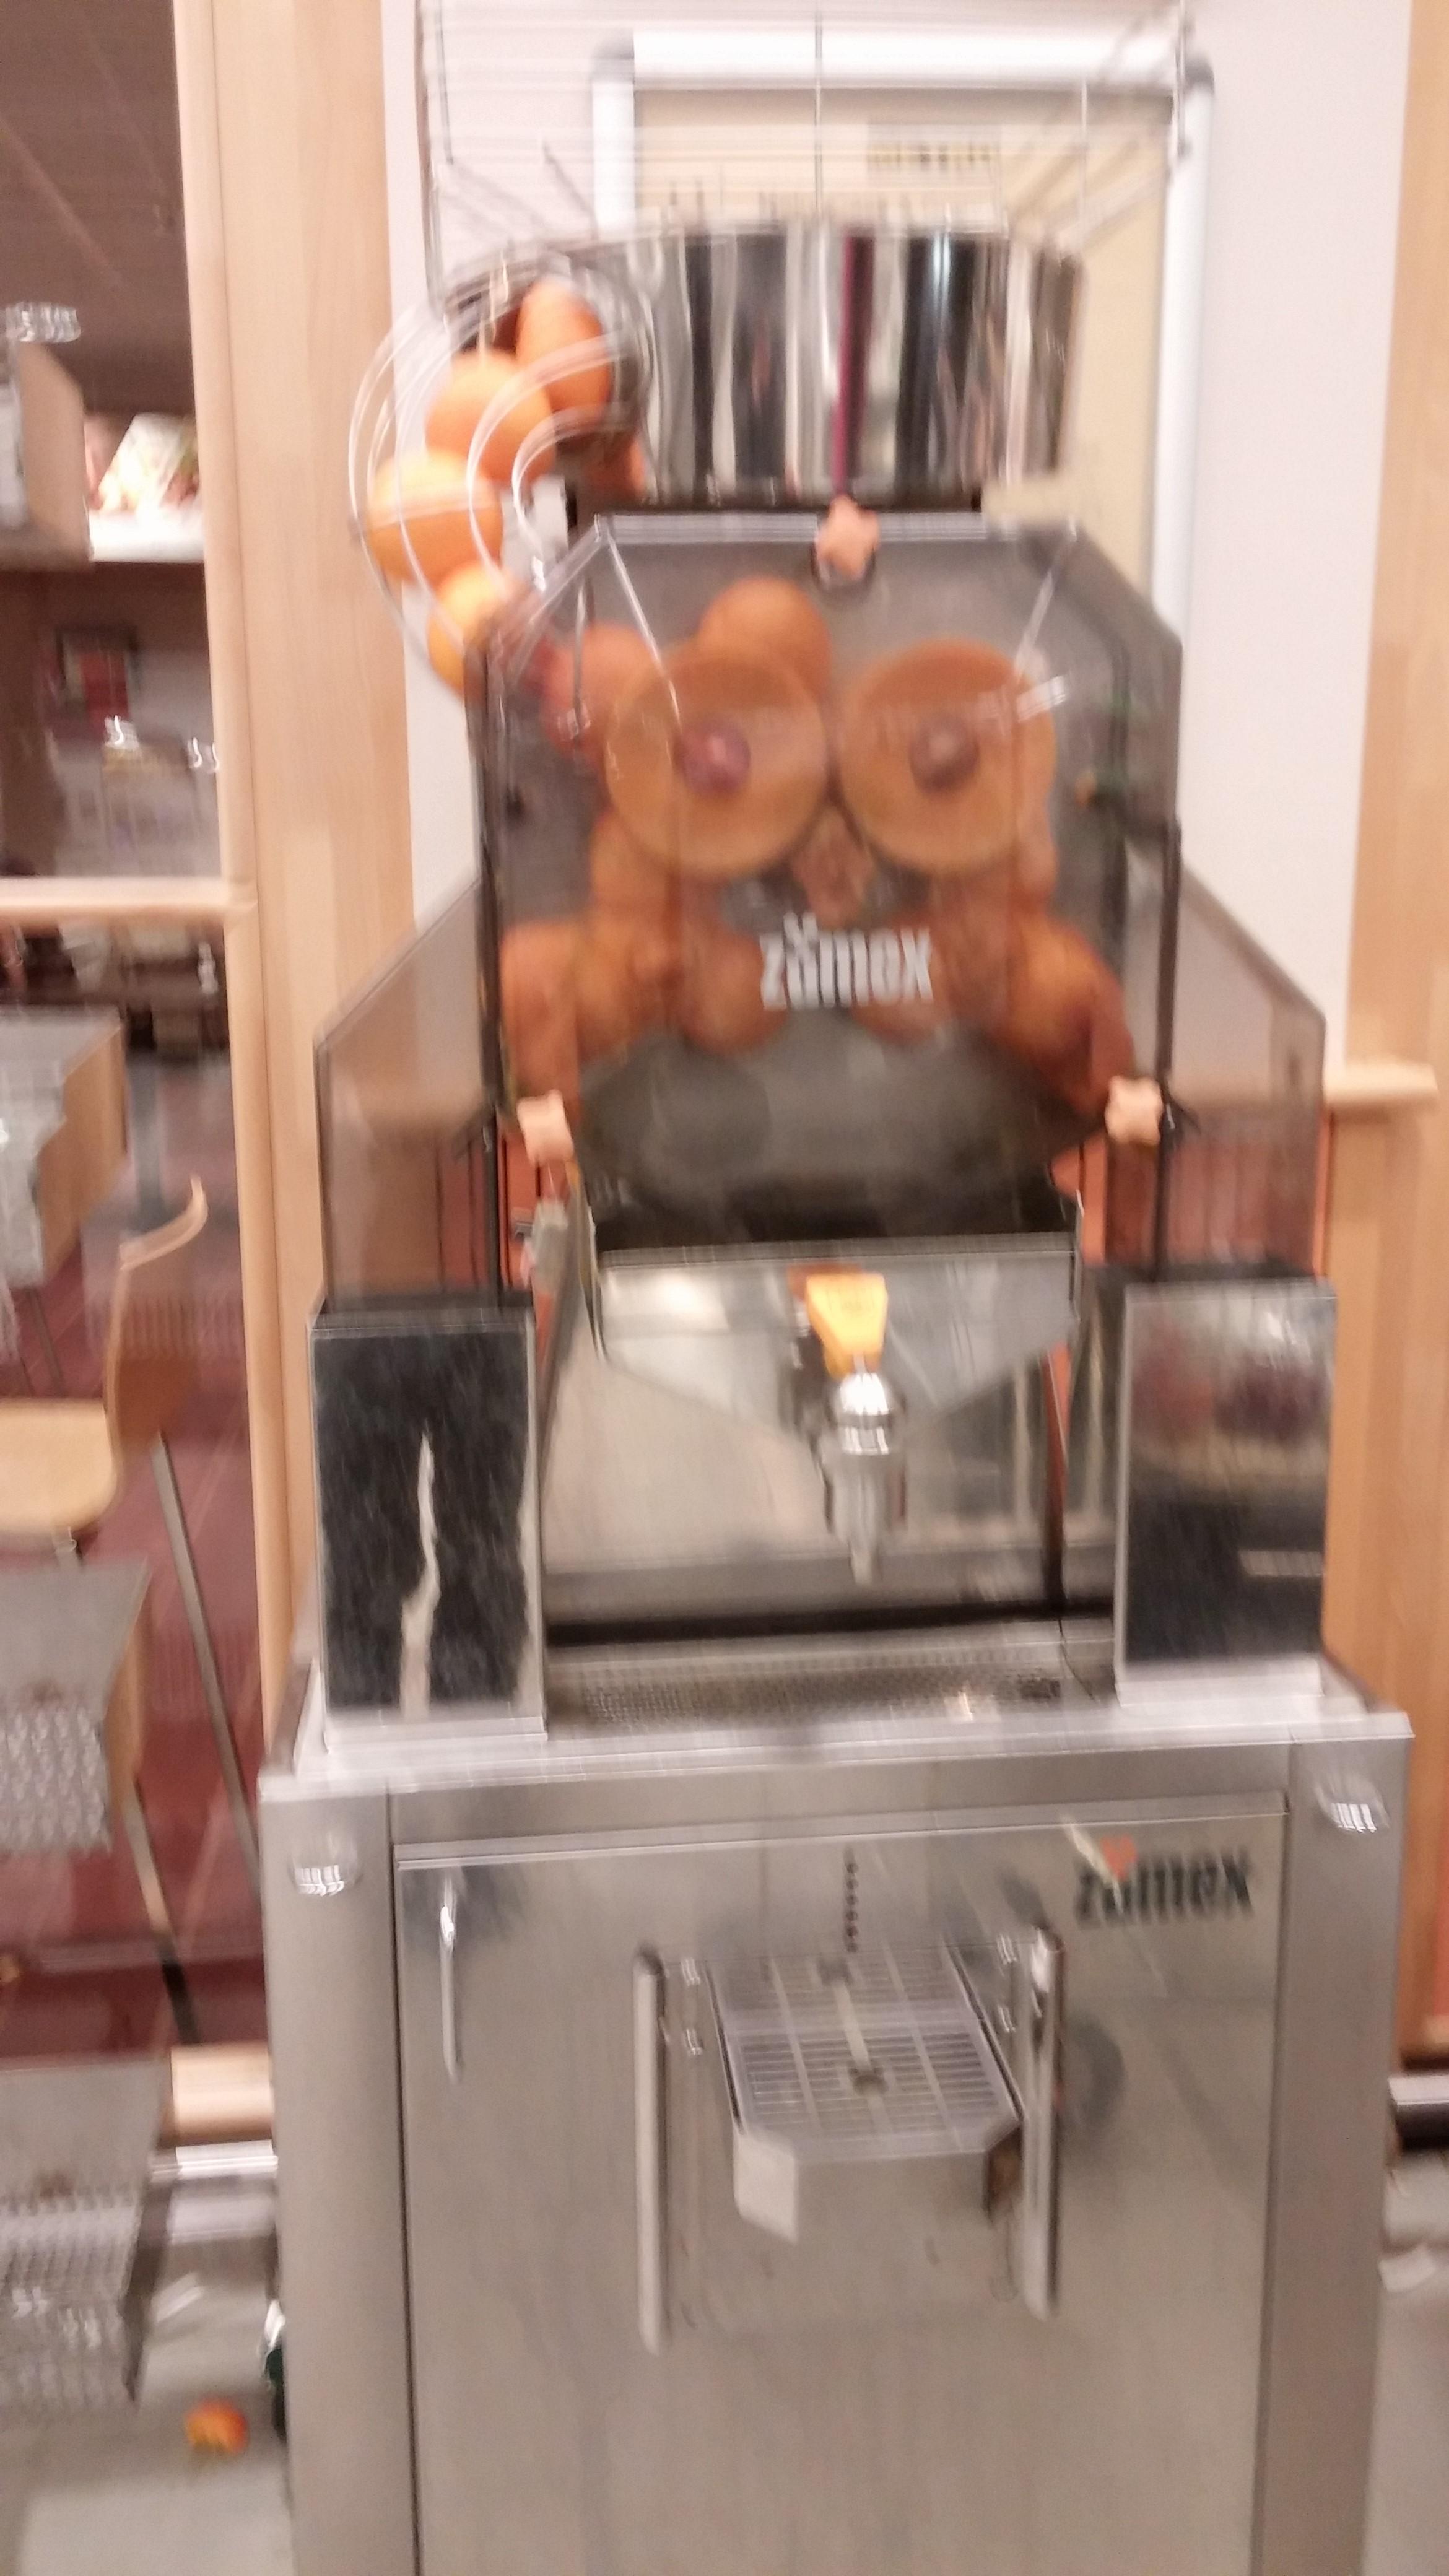 Orange juice machine (sorry it's blurry)